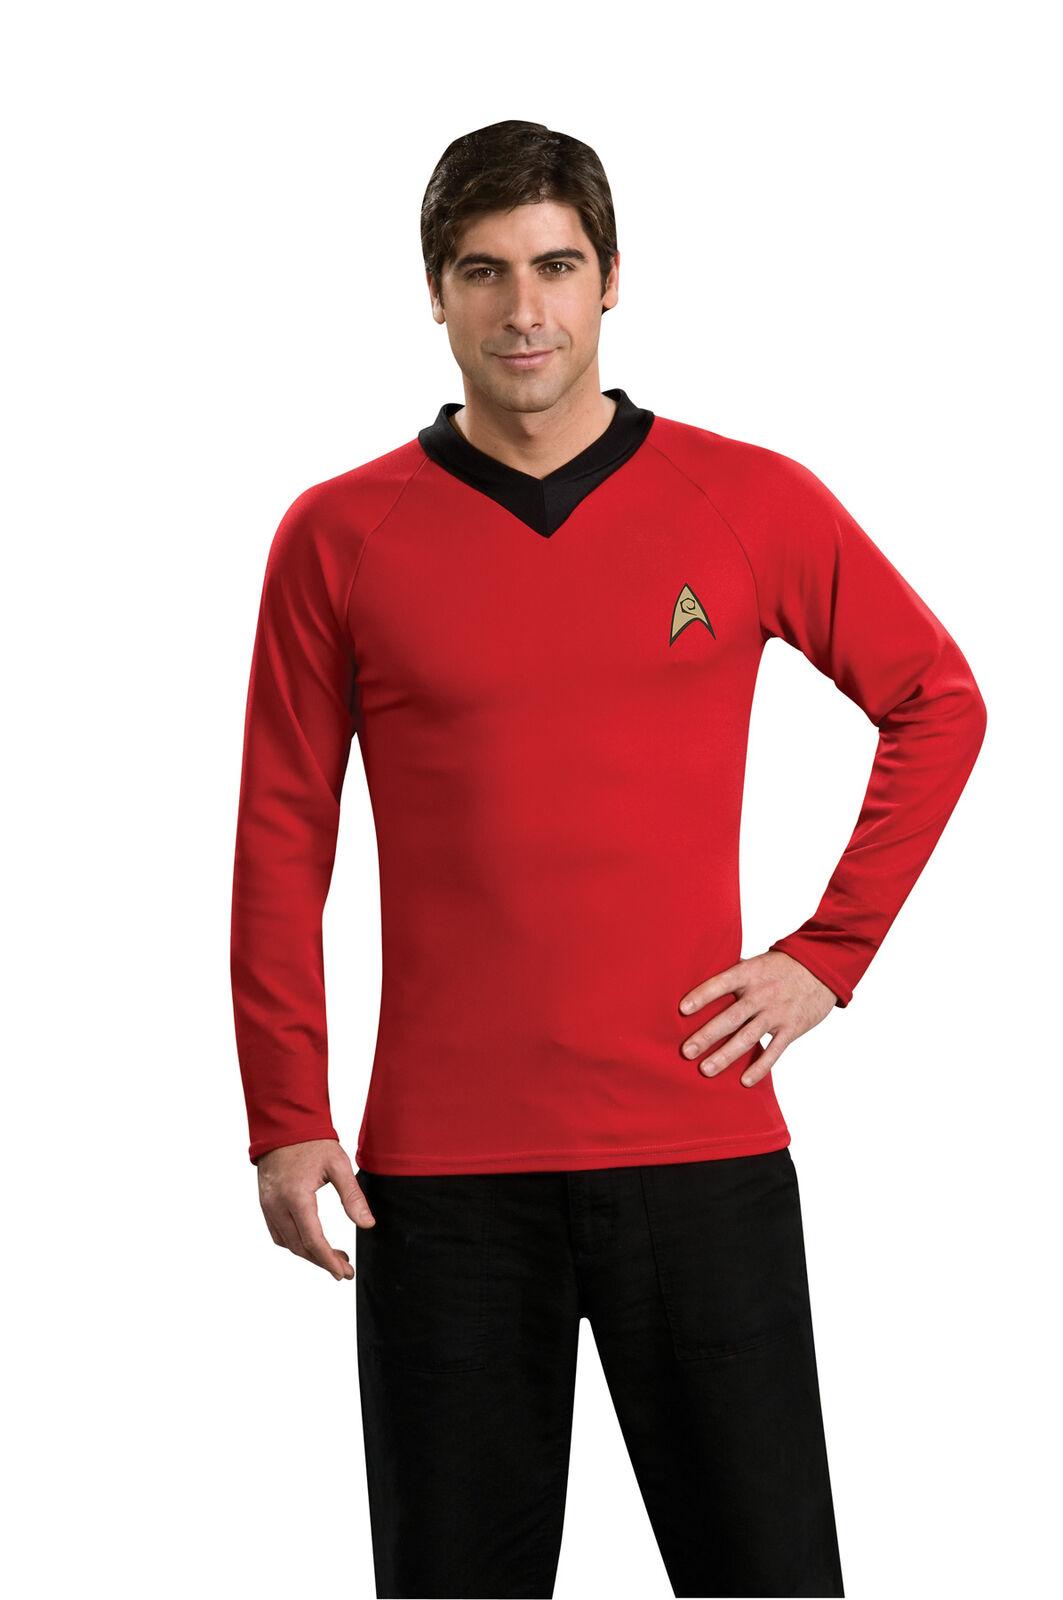 STAR TREK CAPTAIN KIRK CLASSIC RED SHIRT ADULT MENS COSTUME Halloween Party